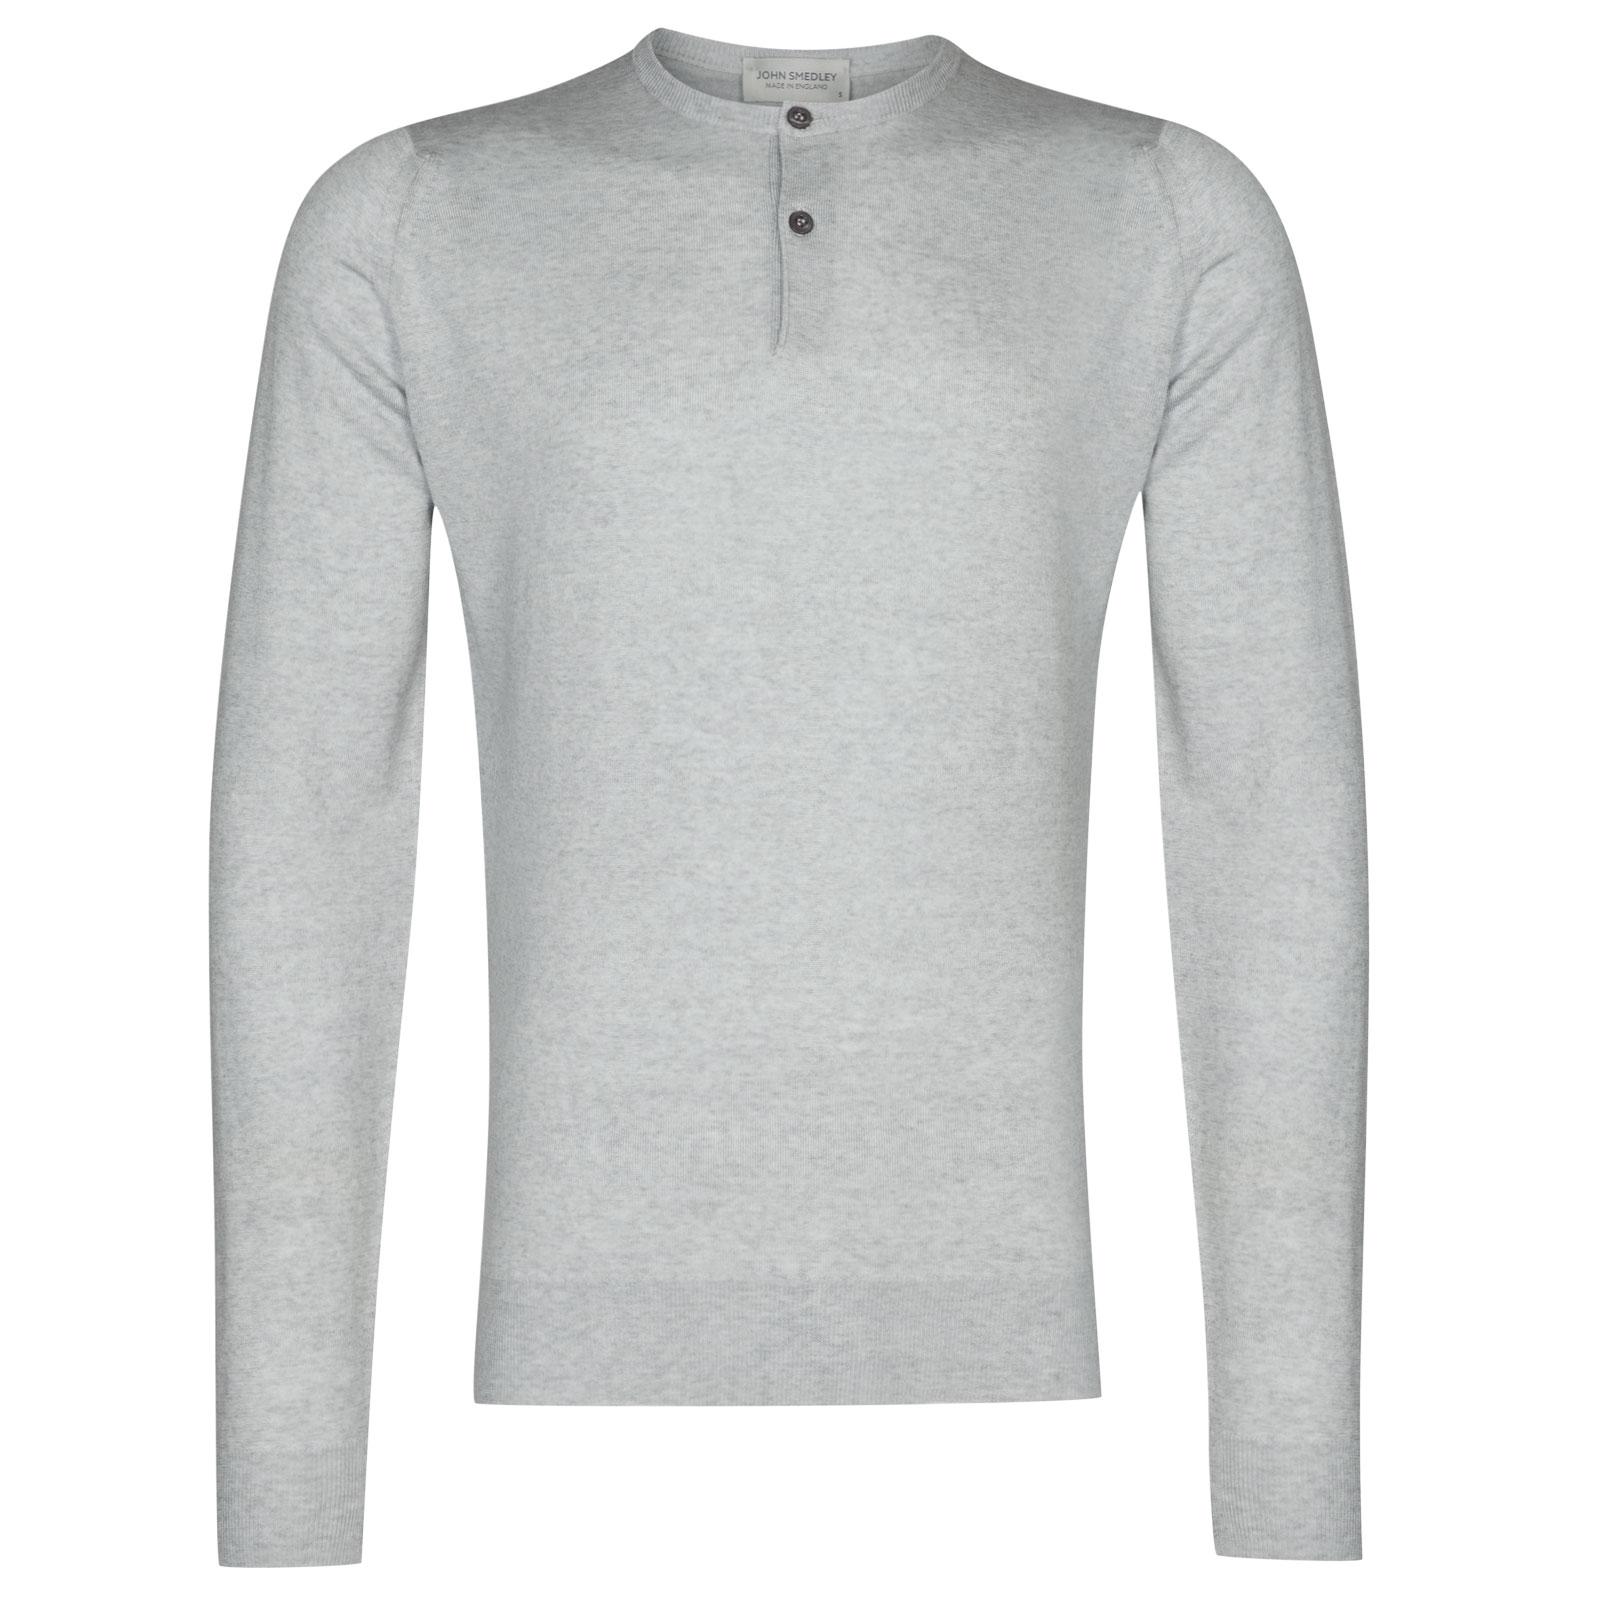 John Smedley Russet Merino Wool Henley Shirt in Bardot Grey-XL